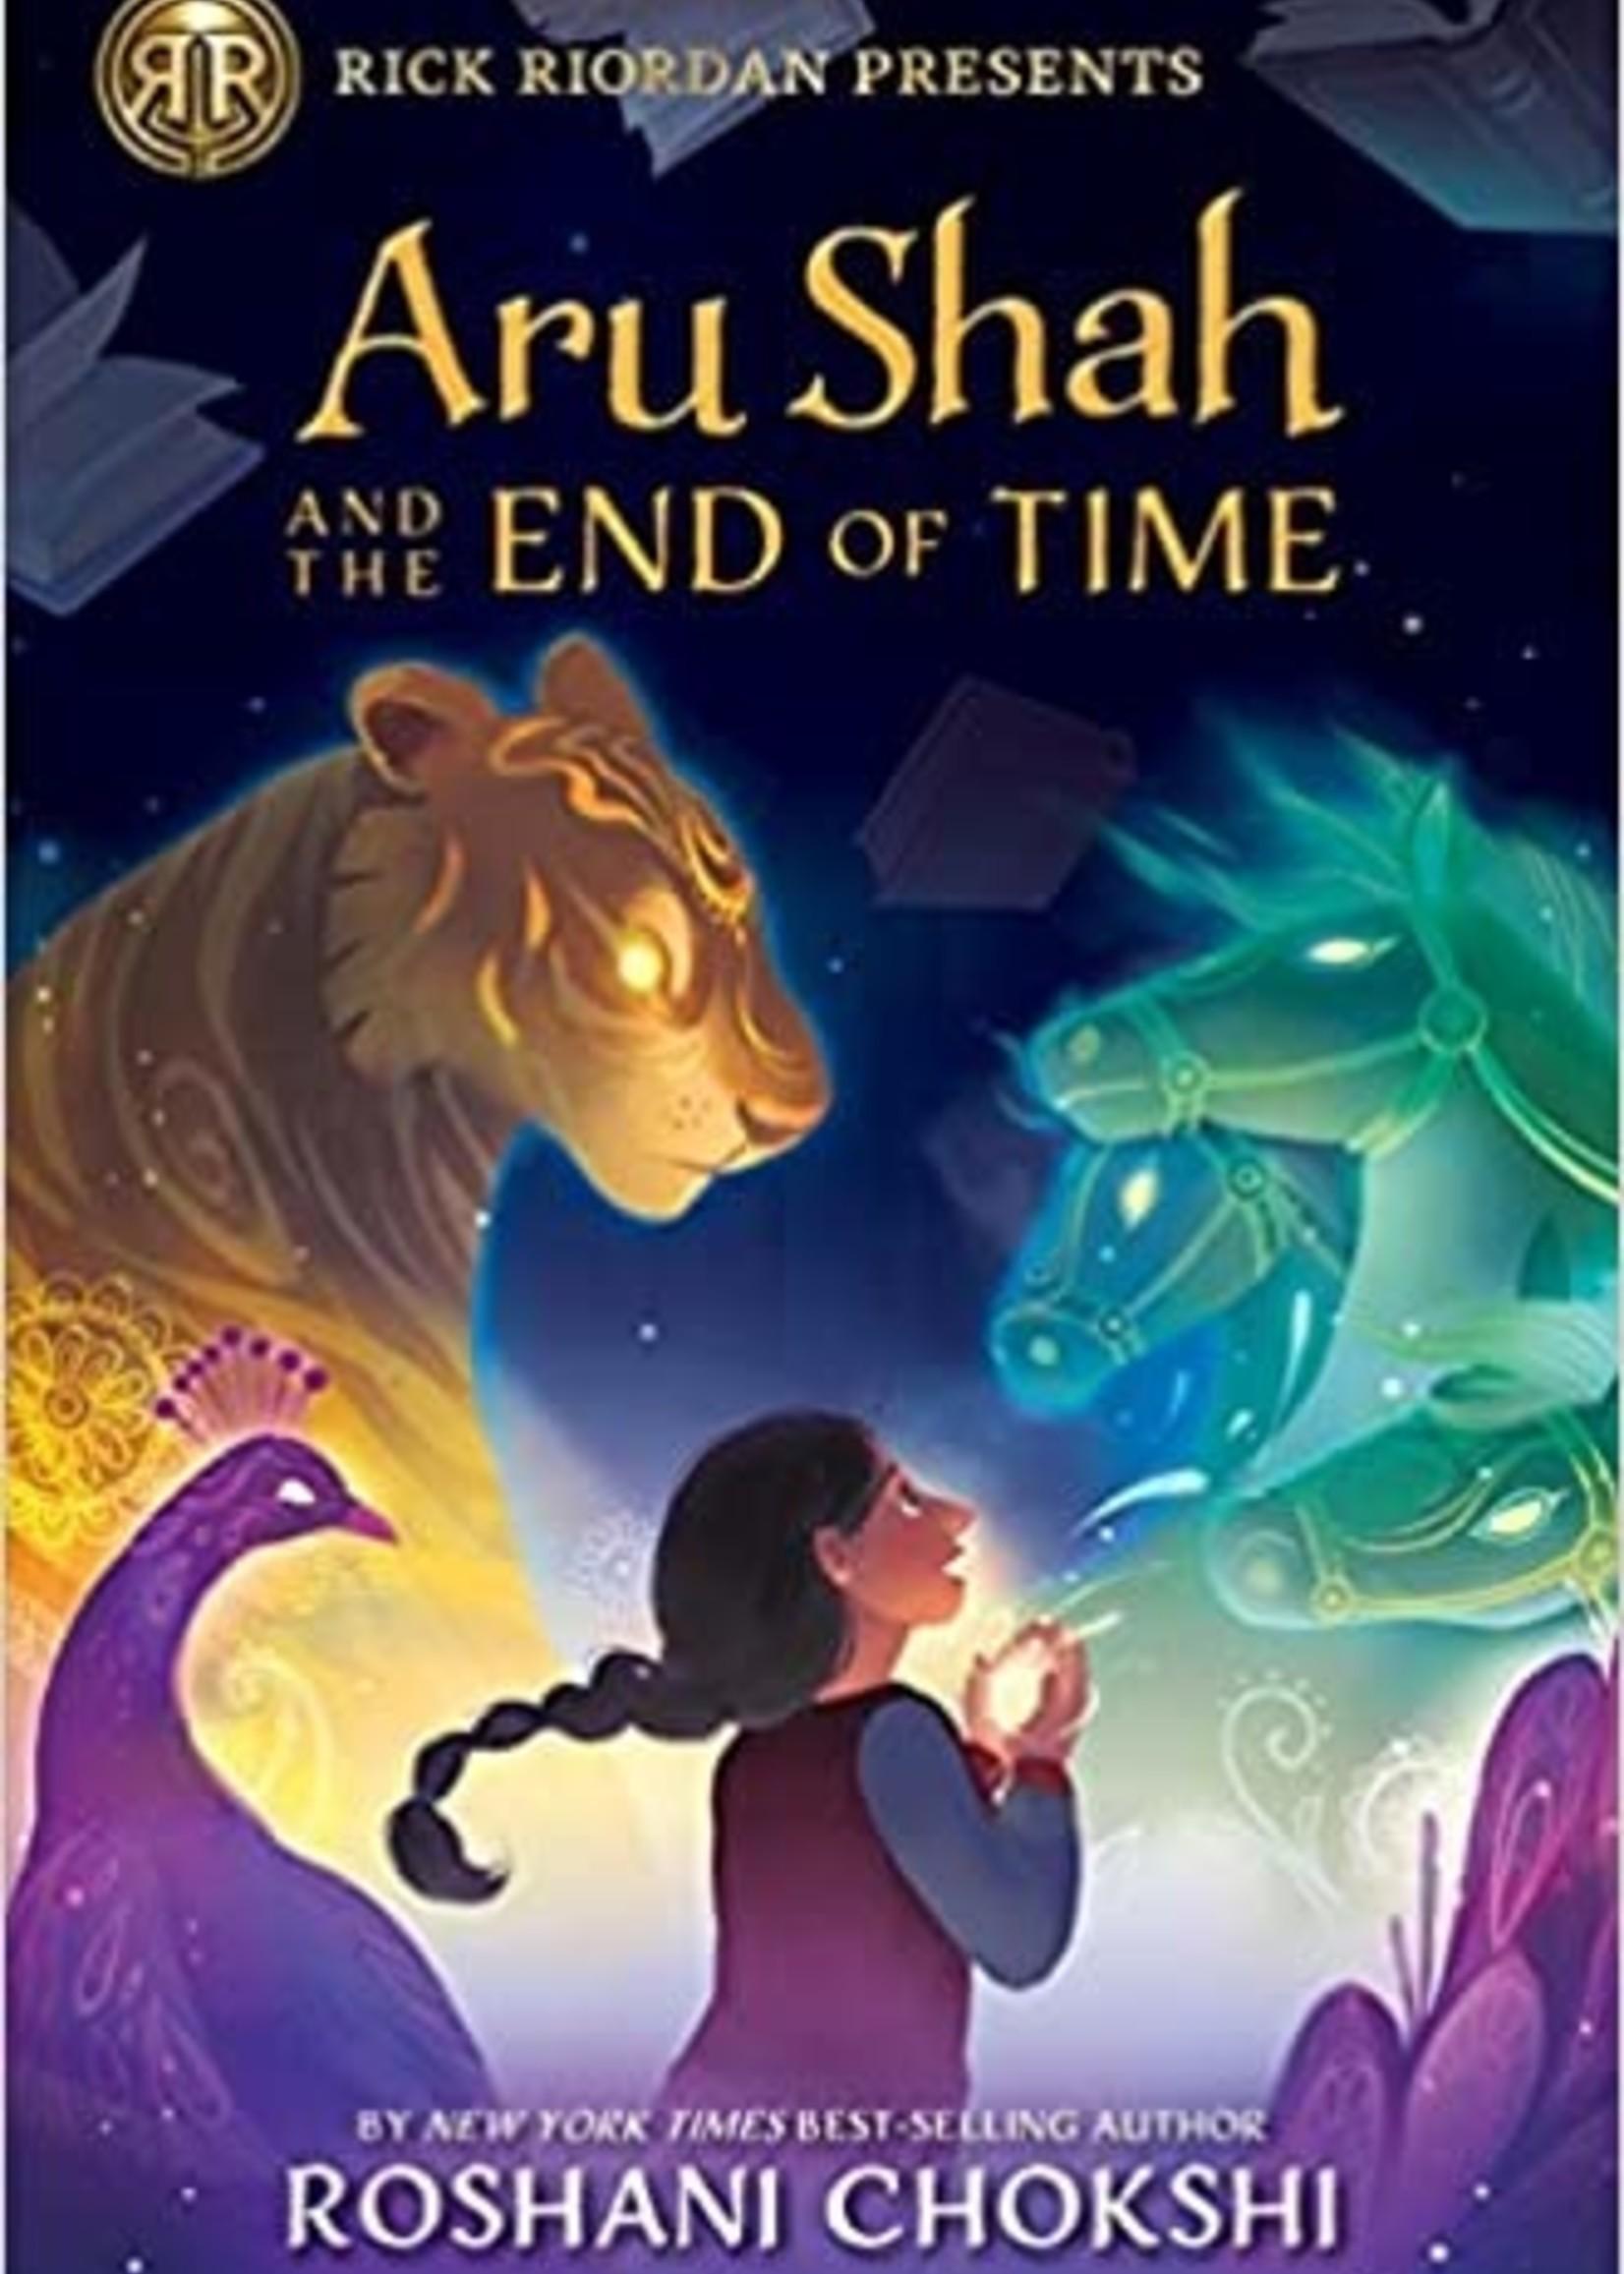 Rick Riordan Presents: Pandava #01, Aru Shah and the End of Time - Paperback